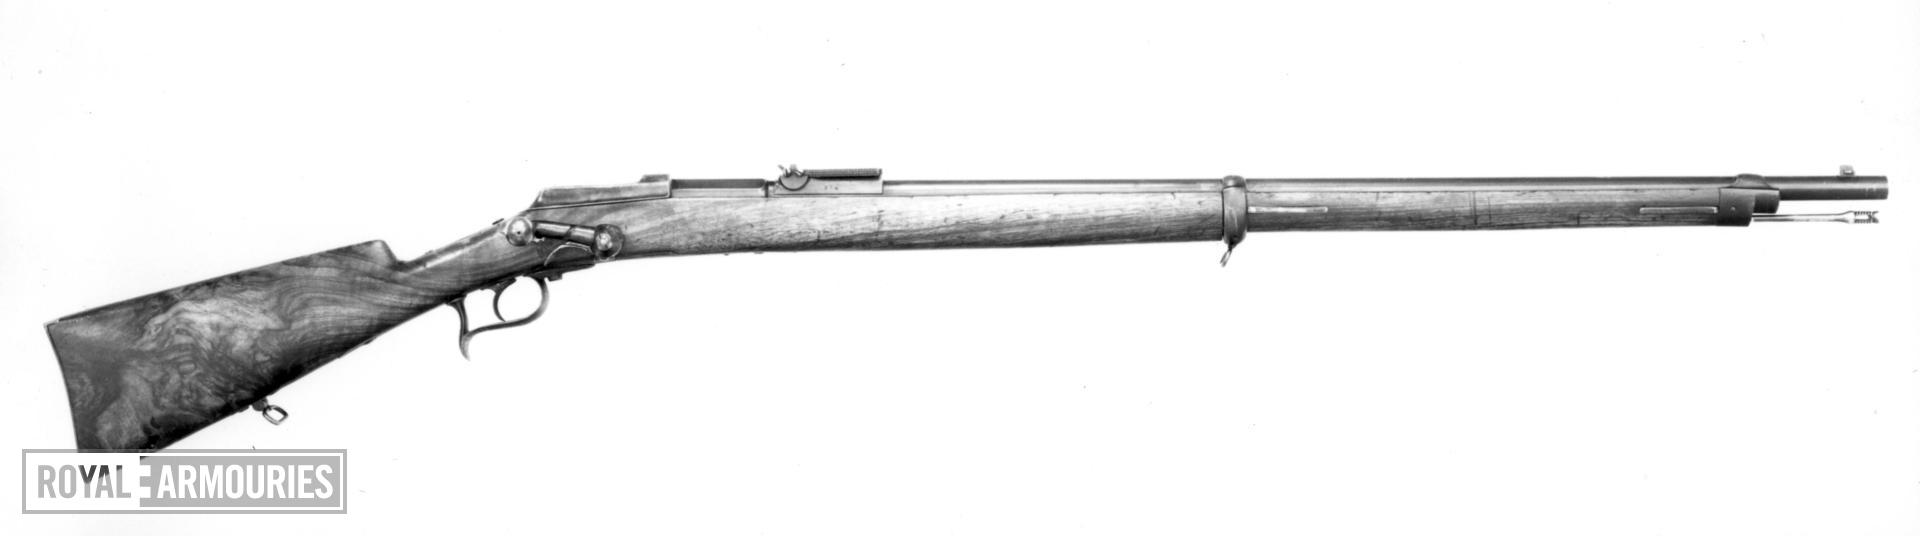 Centrefire breech-loading rifle - Sauerbrey's Patent V. Saverbray's patent